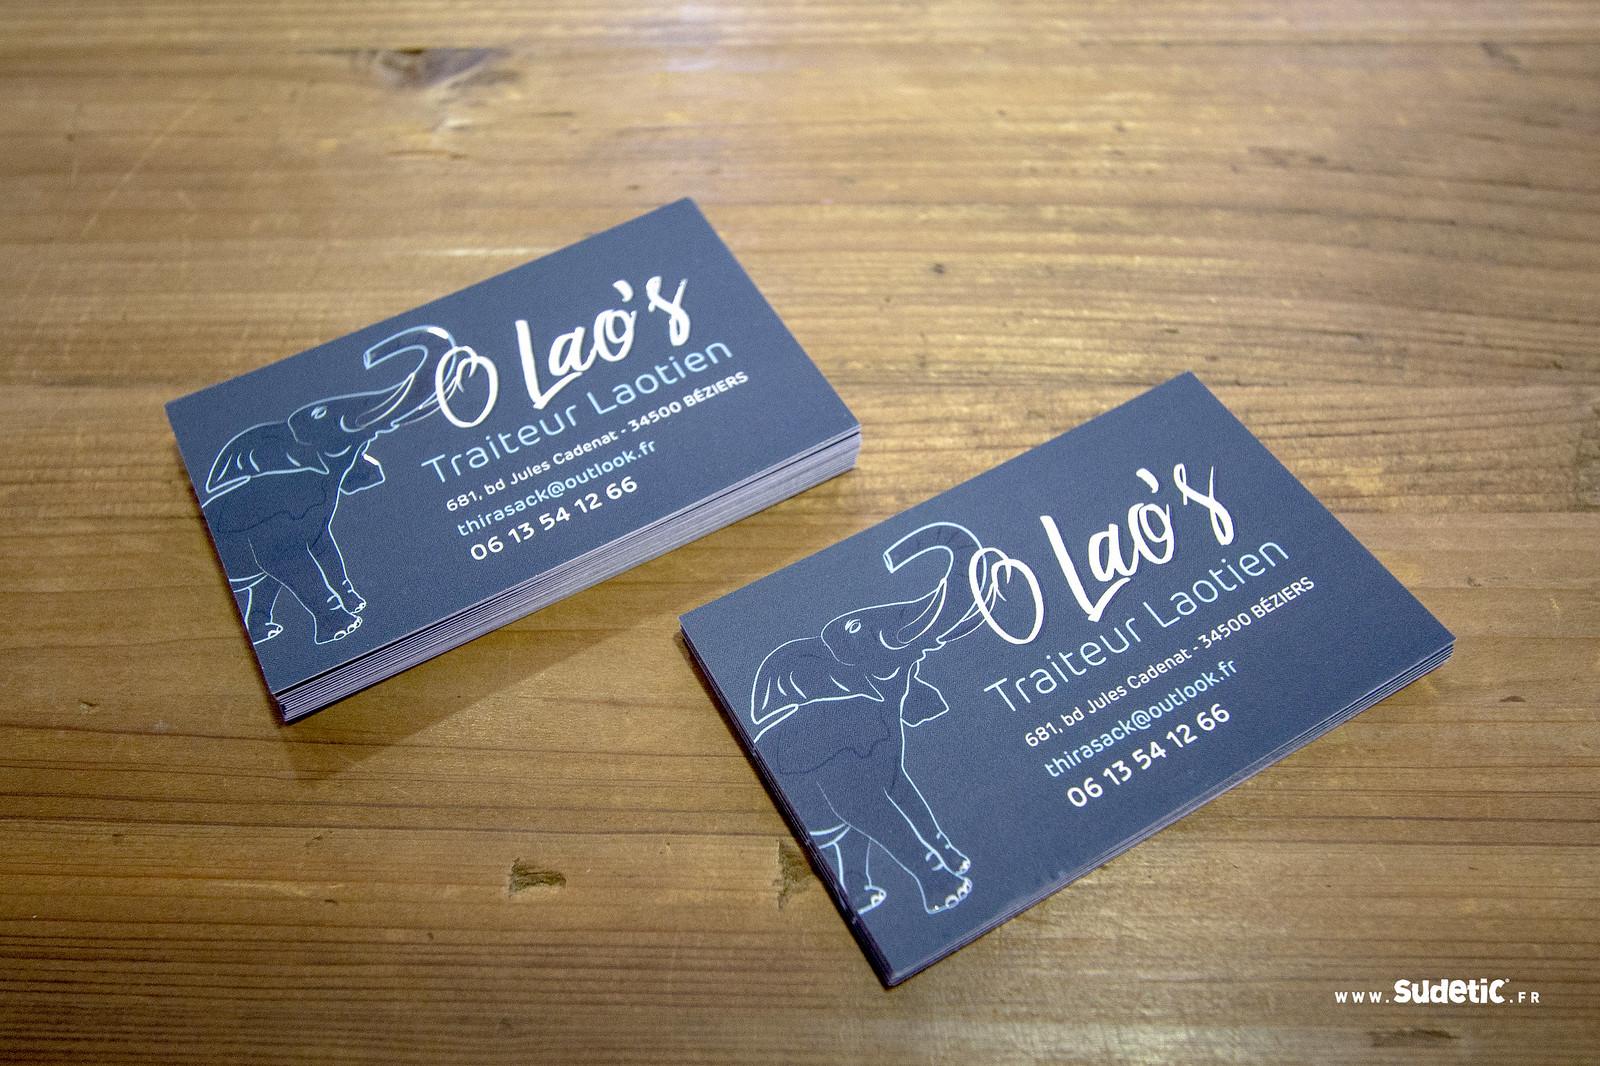 Sudetic cartes de visite O Lao's-3